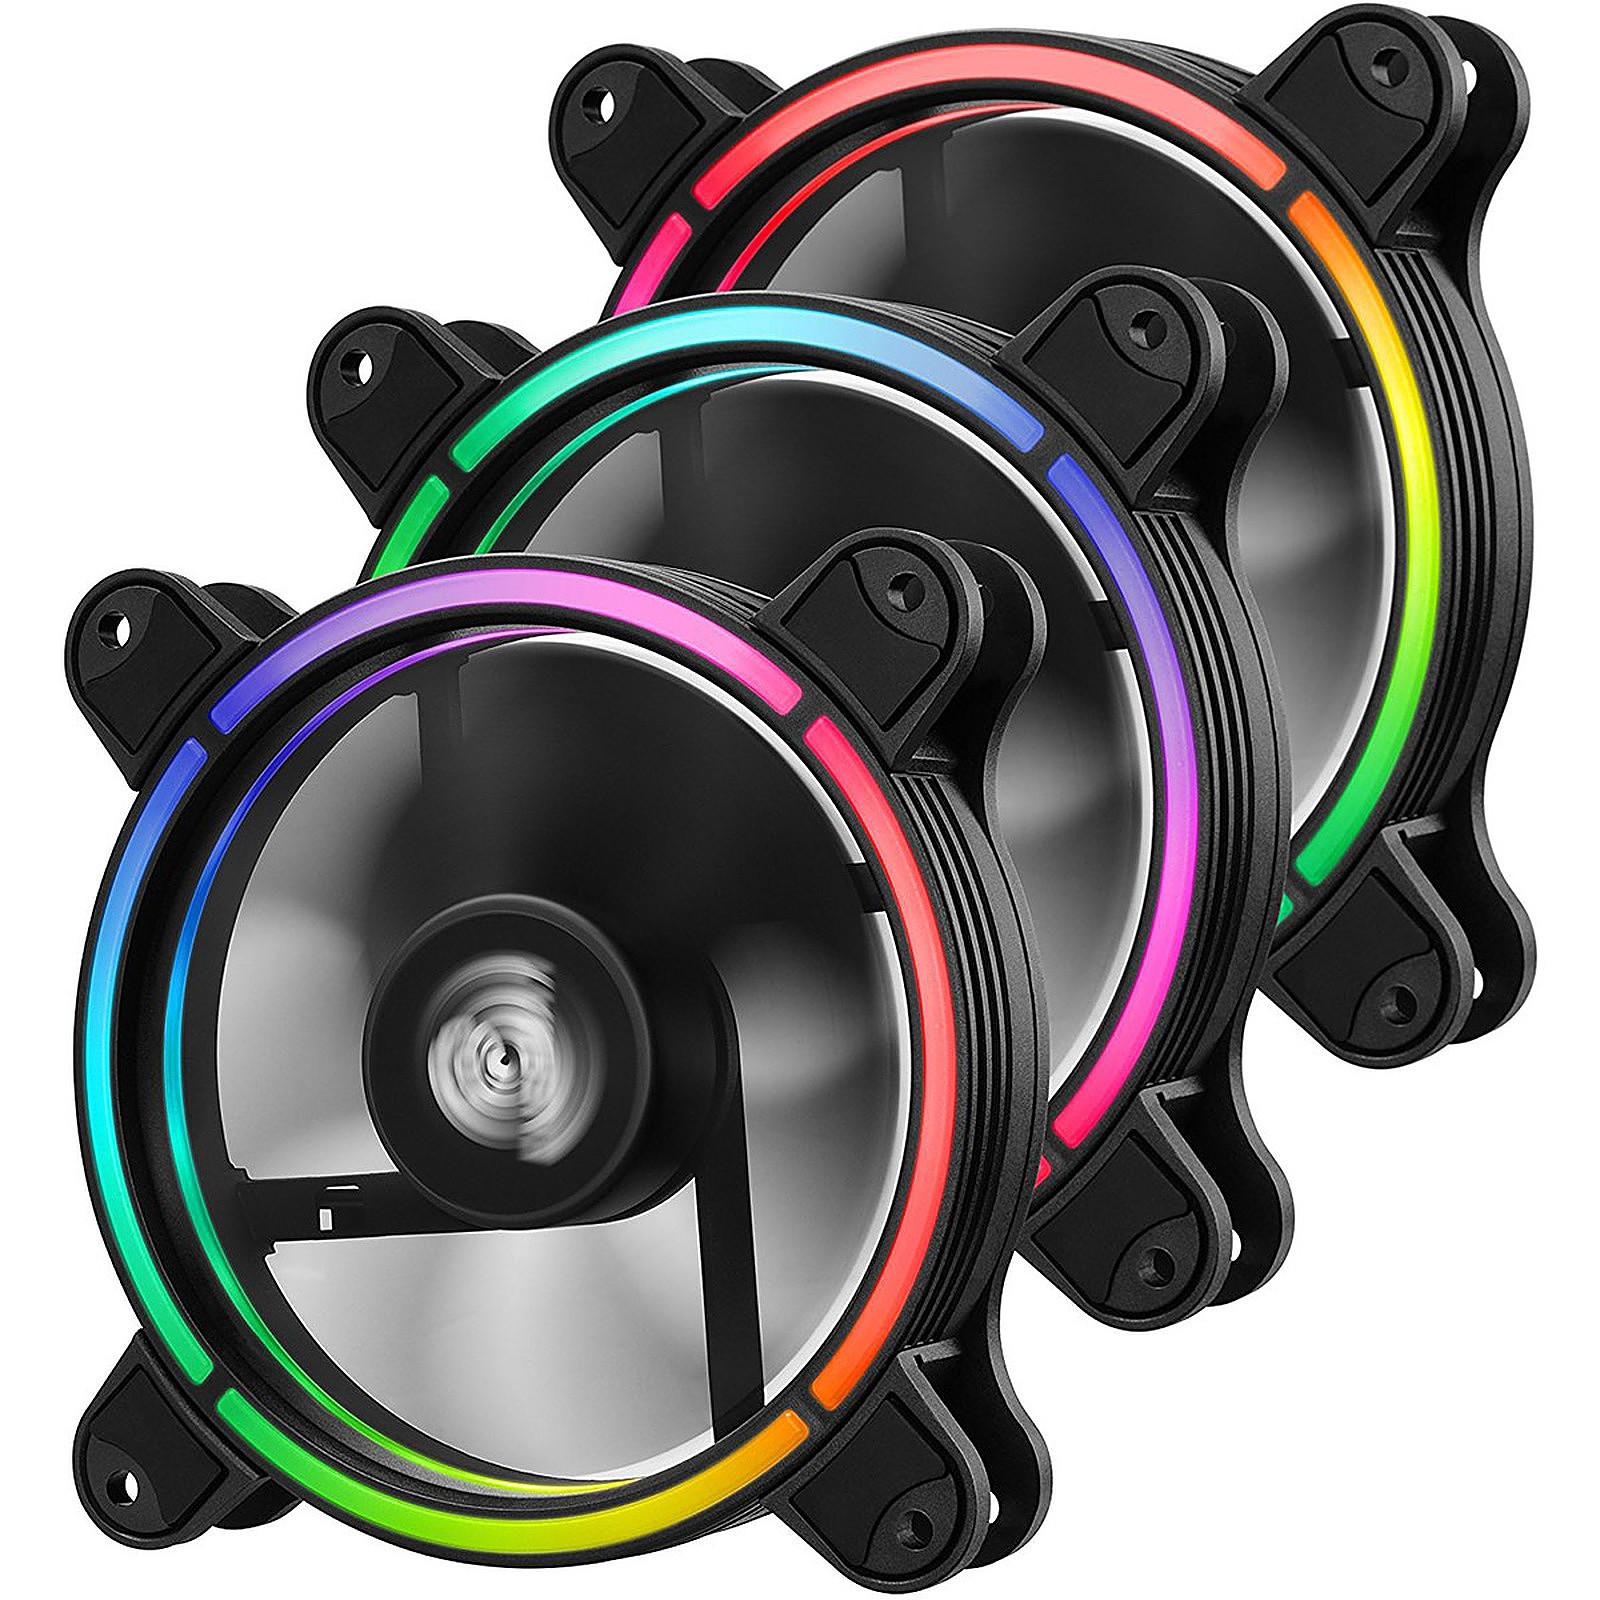 Pack de 3 Ventilateurs PC Enermax T.B. RGB AD - 120 mm